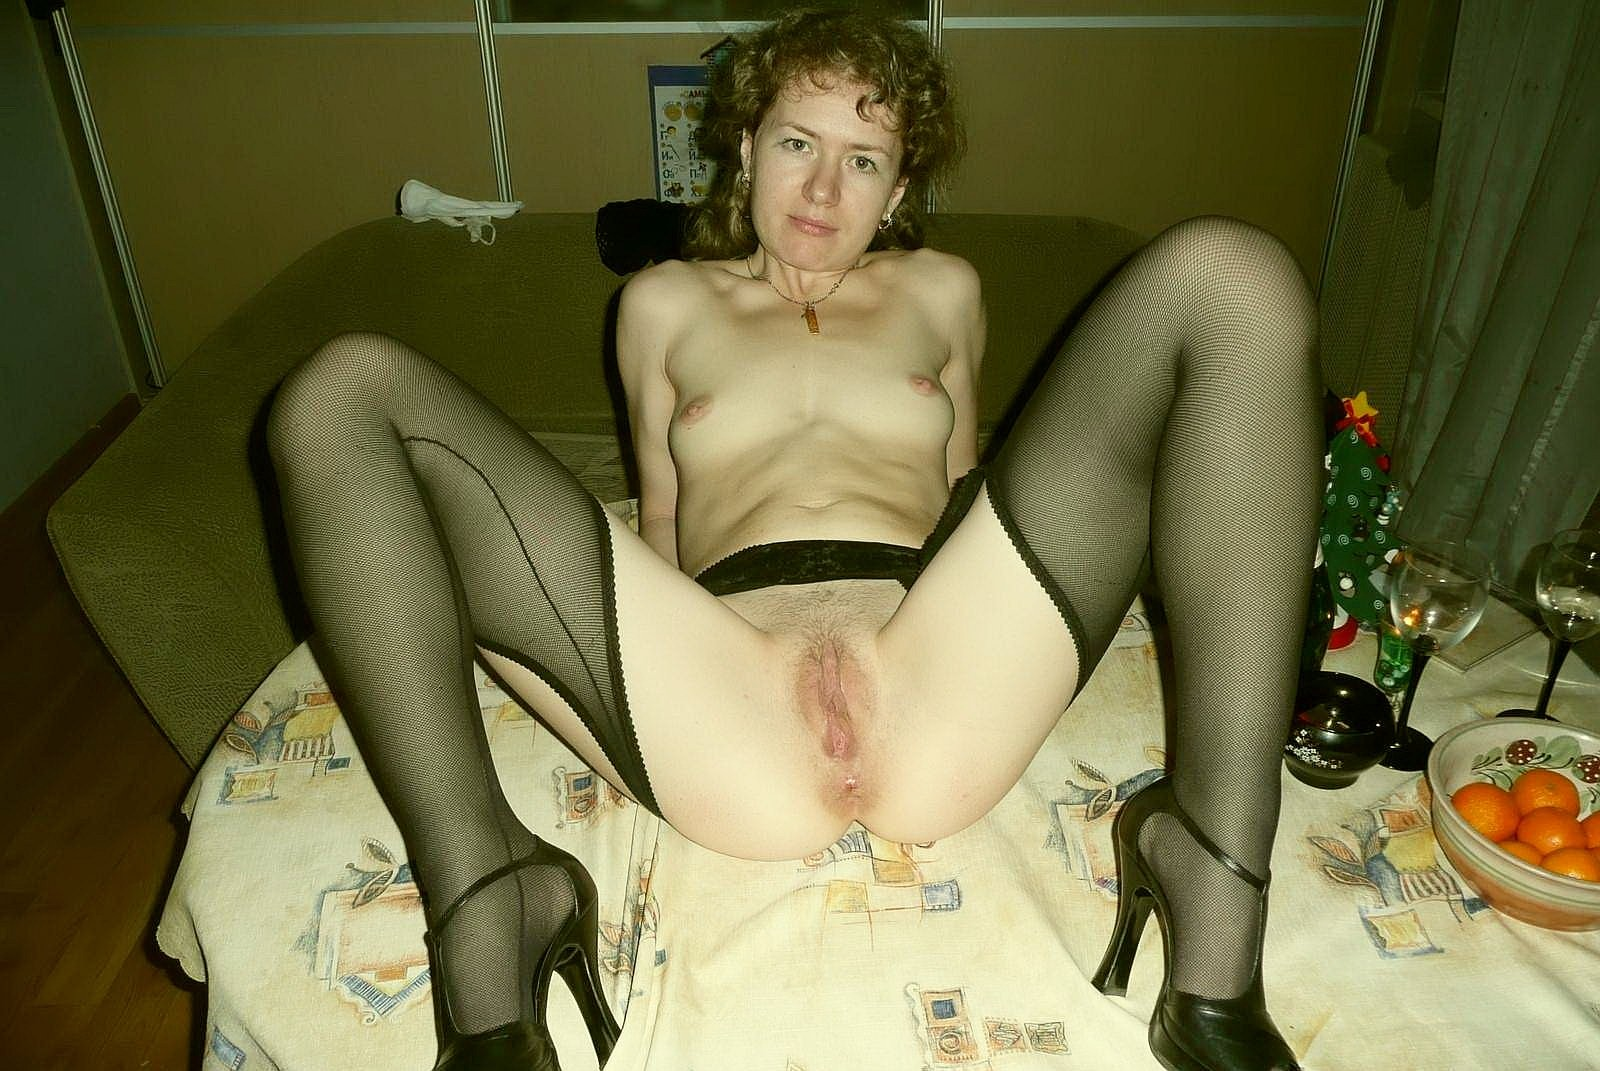 дамочки дома фото порно